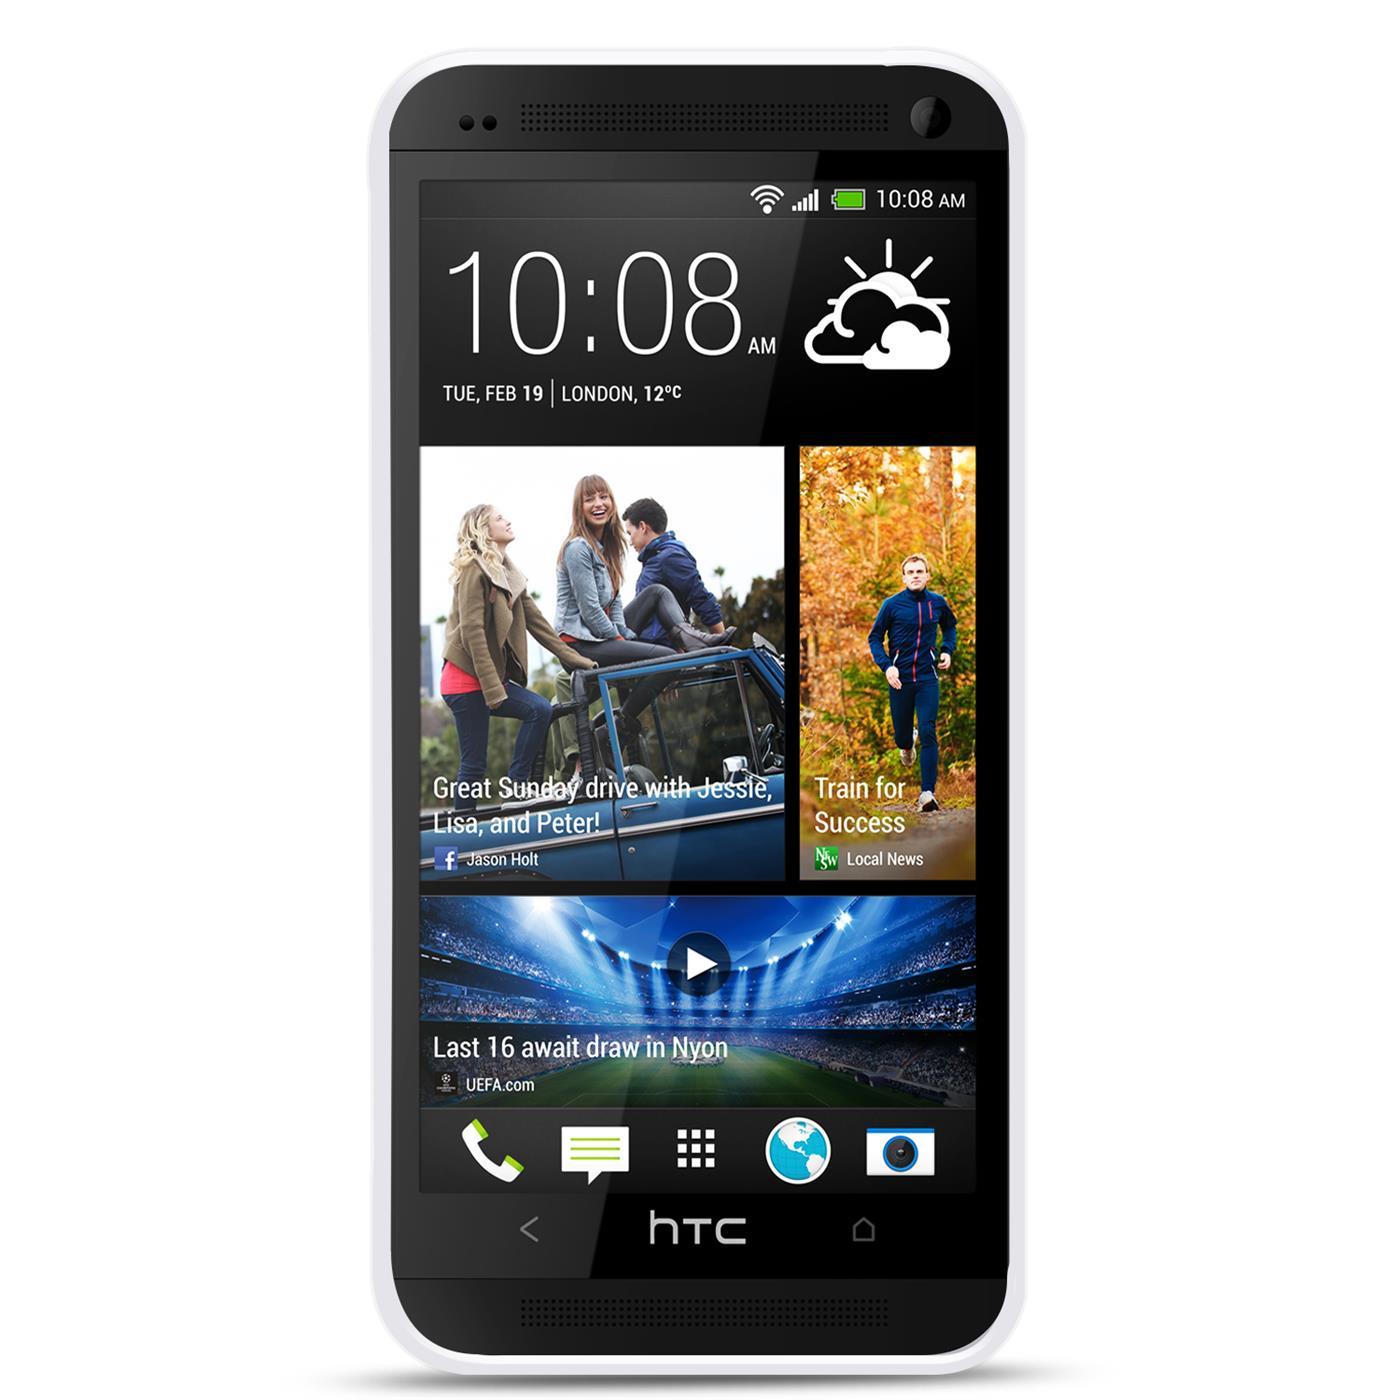 HTC-One-m9-Silikon-Gel-S-Line-Case-Cover-Ultra-Thin-Slim-Back-Bumper Indexbild 29